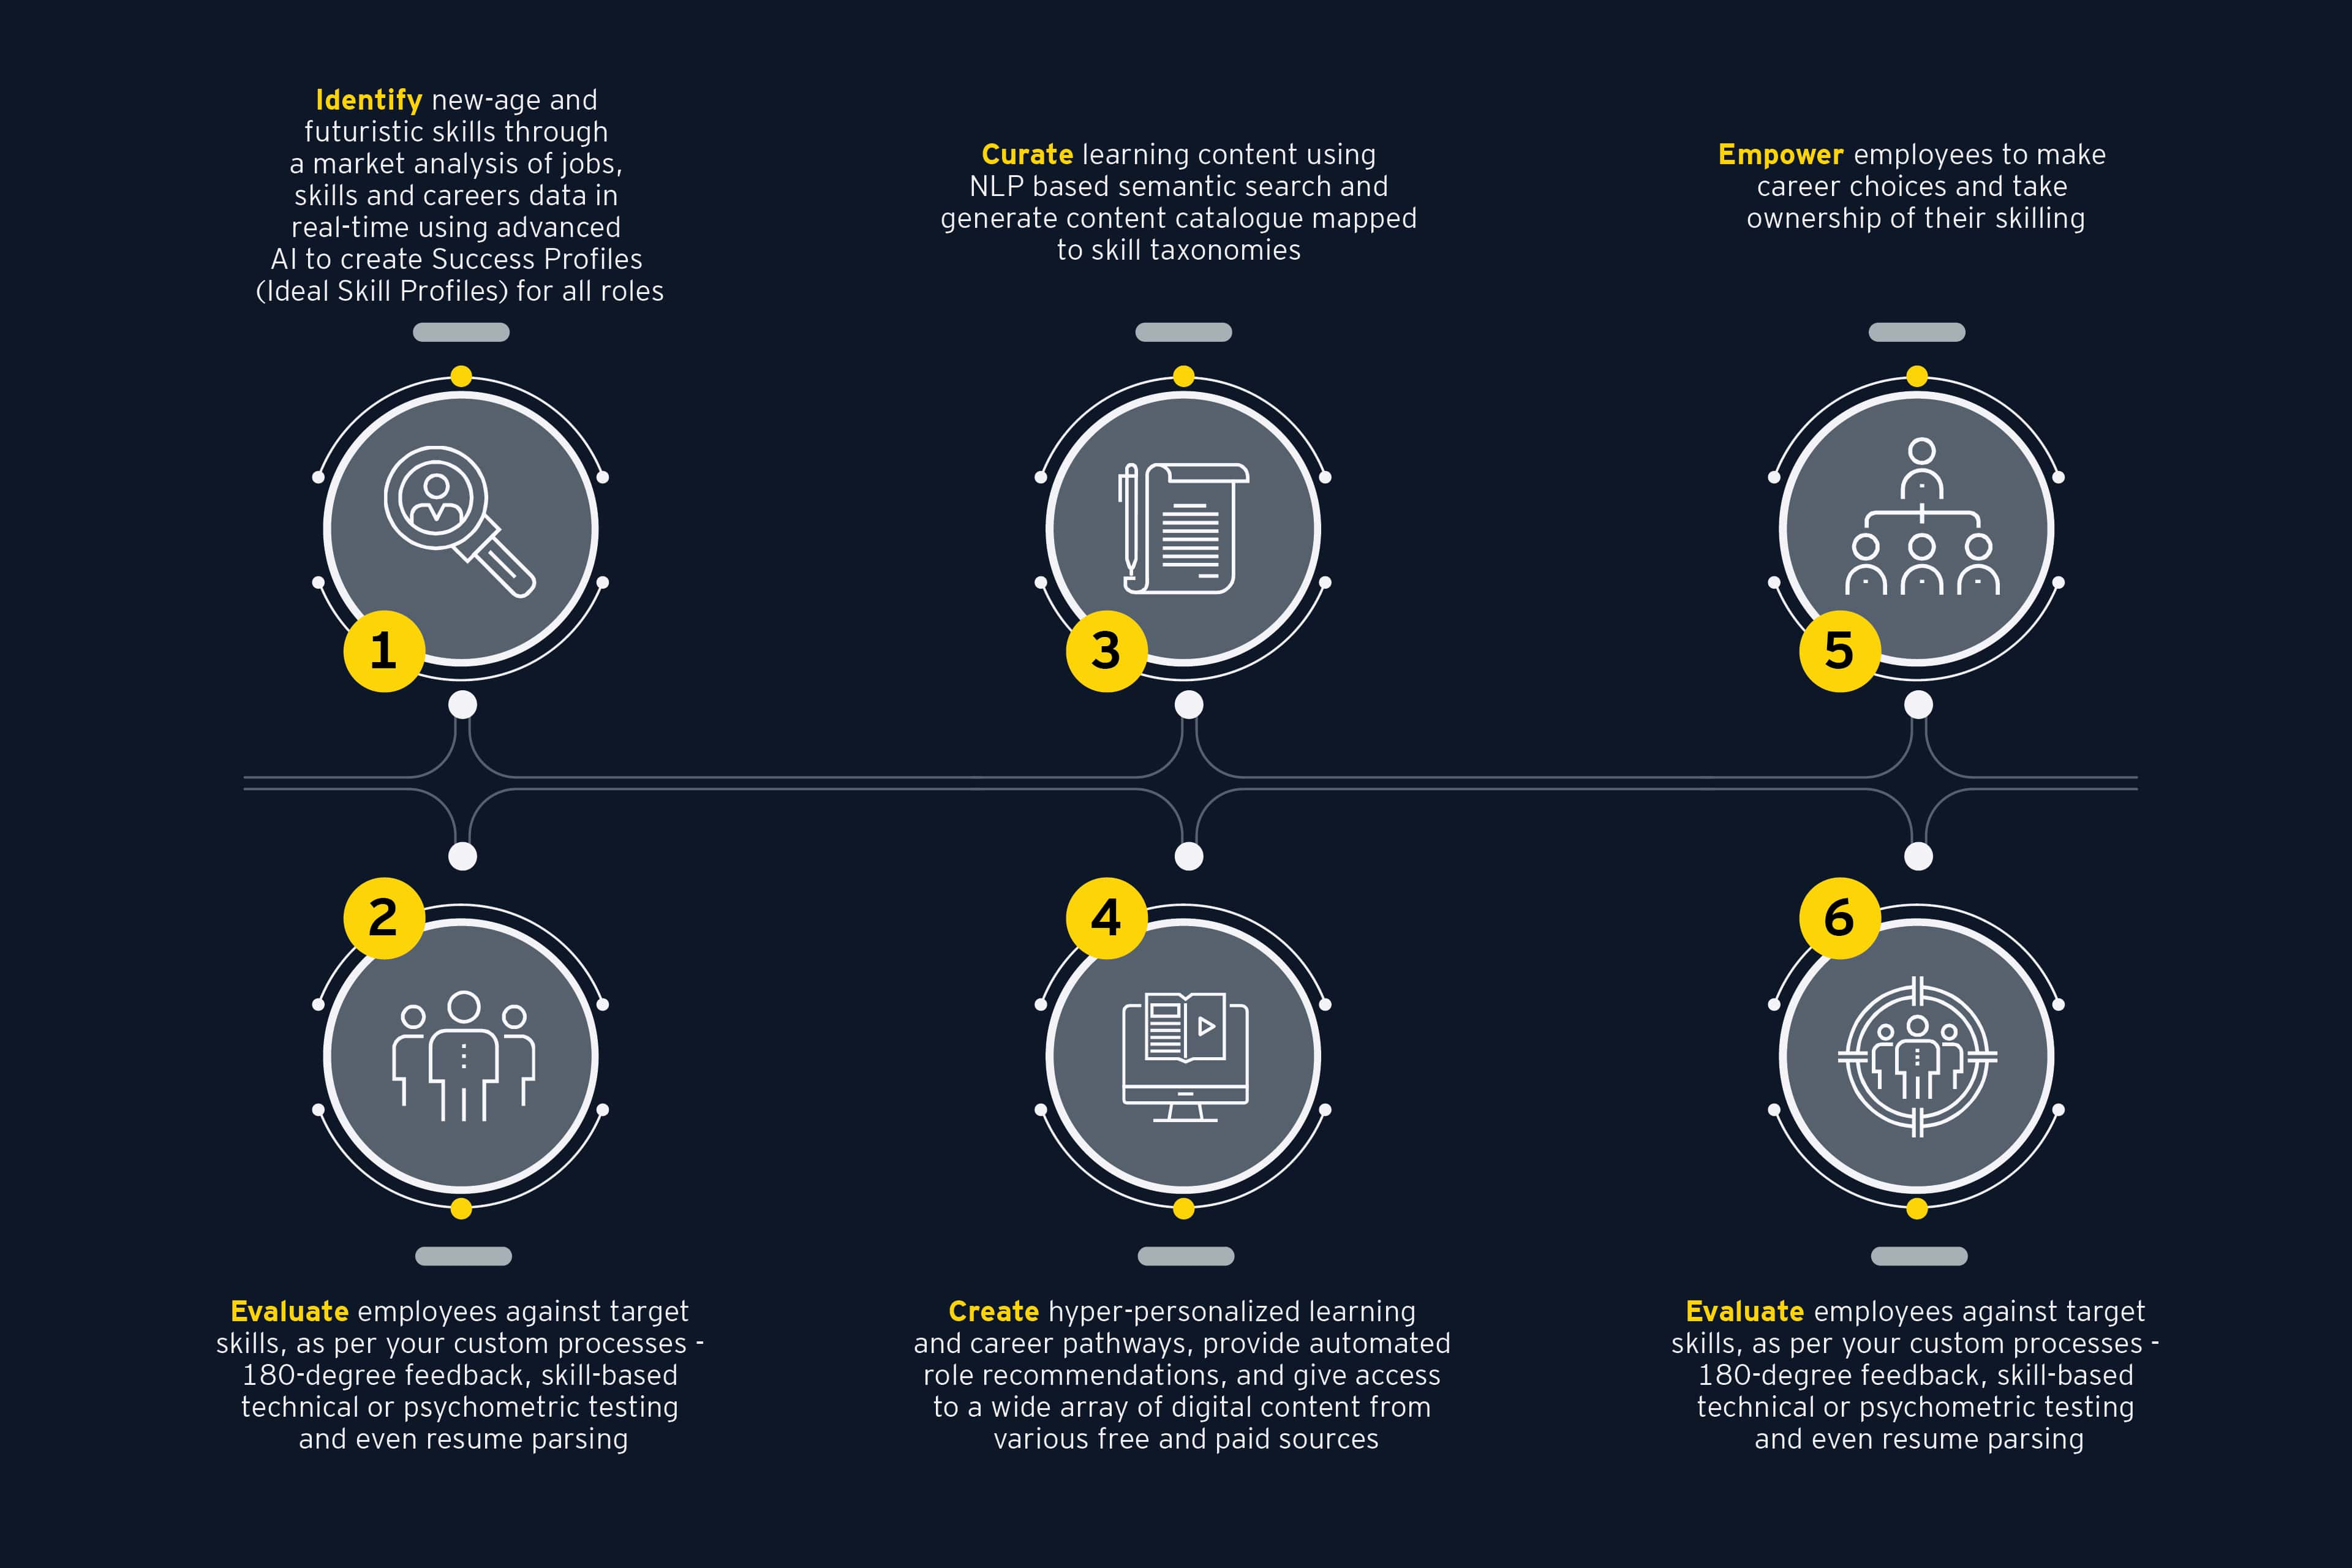 Six steps of EY Spotmentor